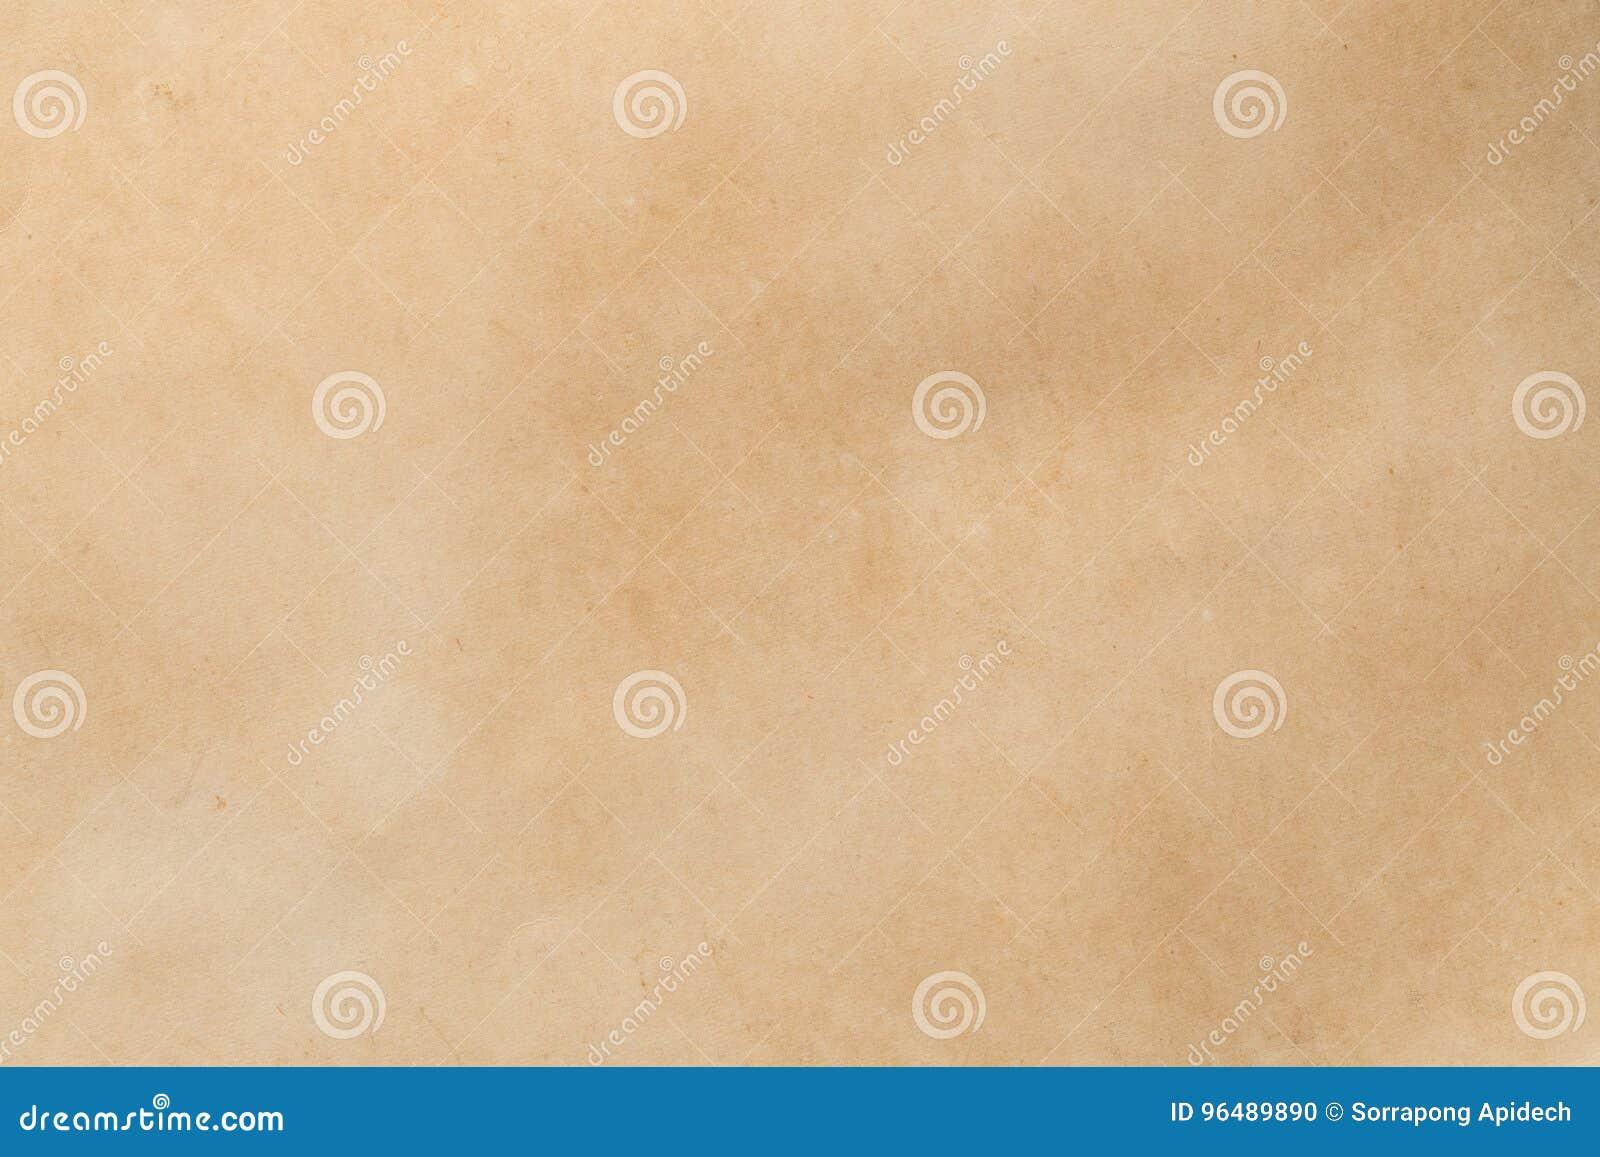 Abstrakt gammalt papper texturerar bakgrund